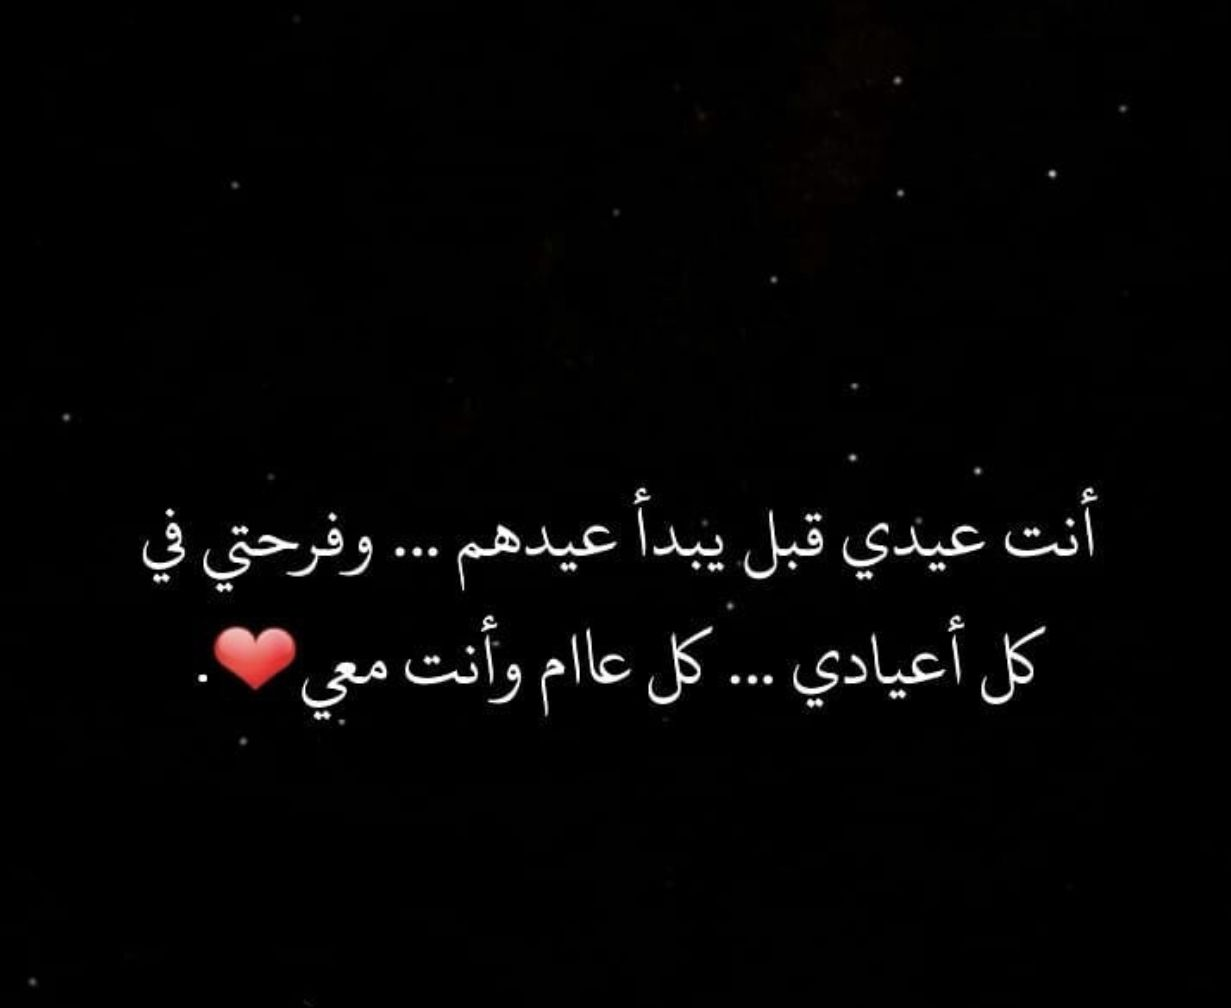 انت عيدي Phone Wallpaper Wallpaper Arabic Calligraphy